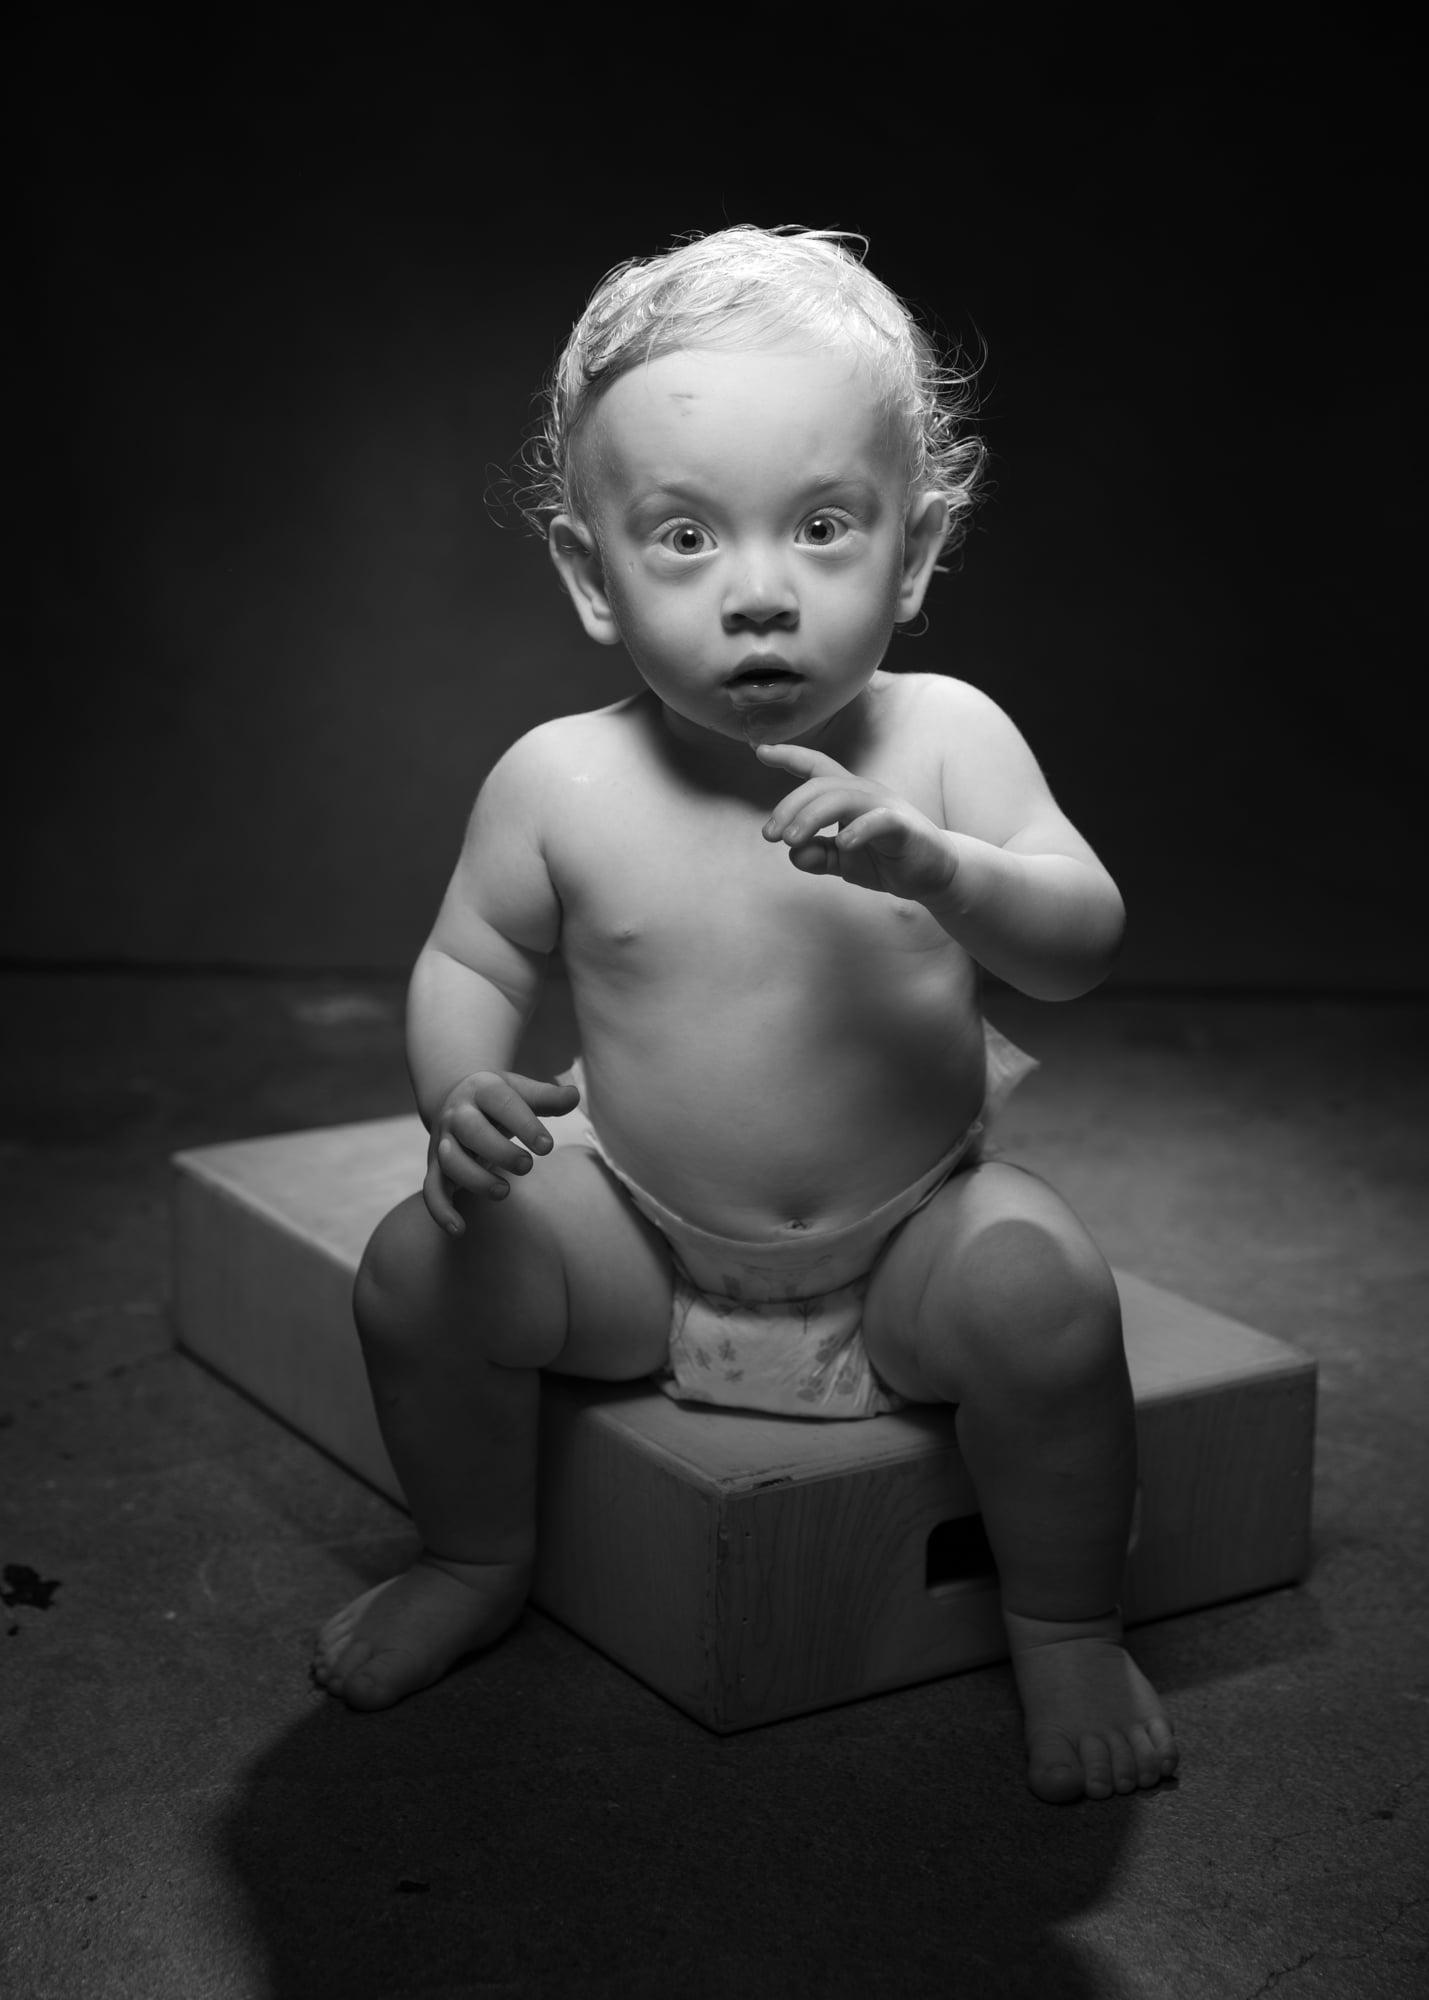 Children's portrait by Jason Guy